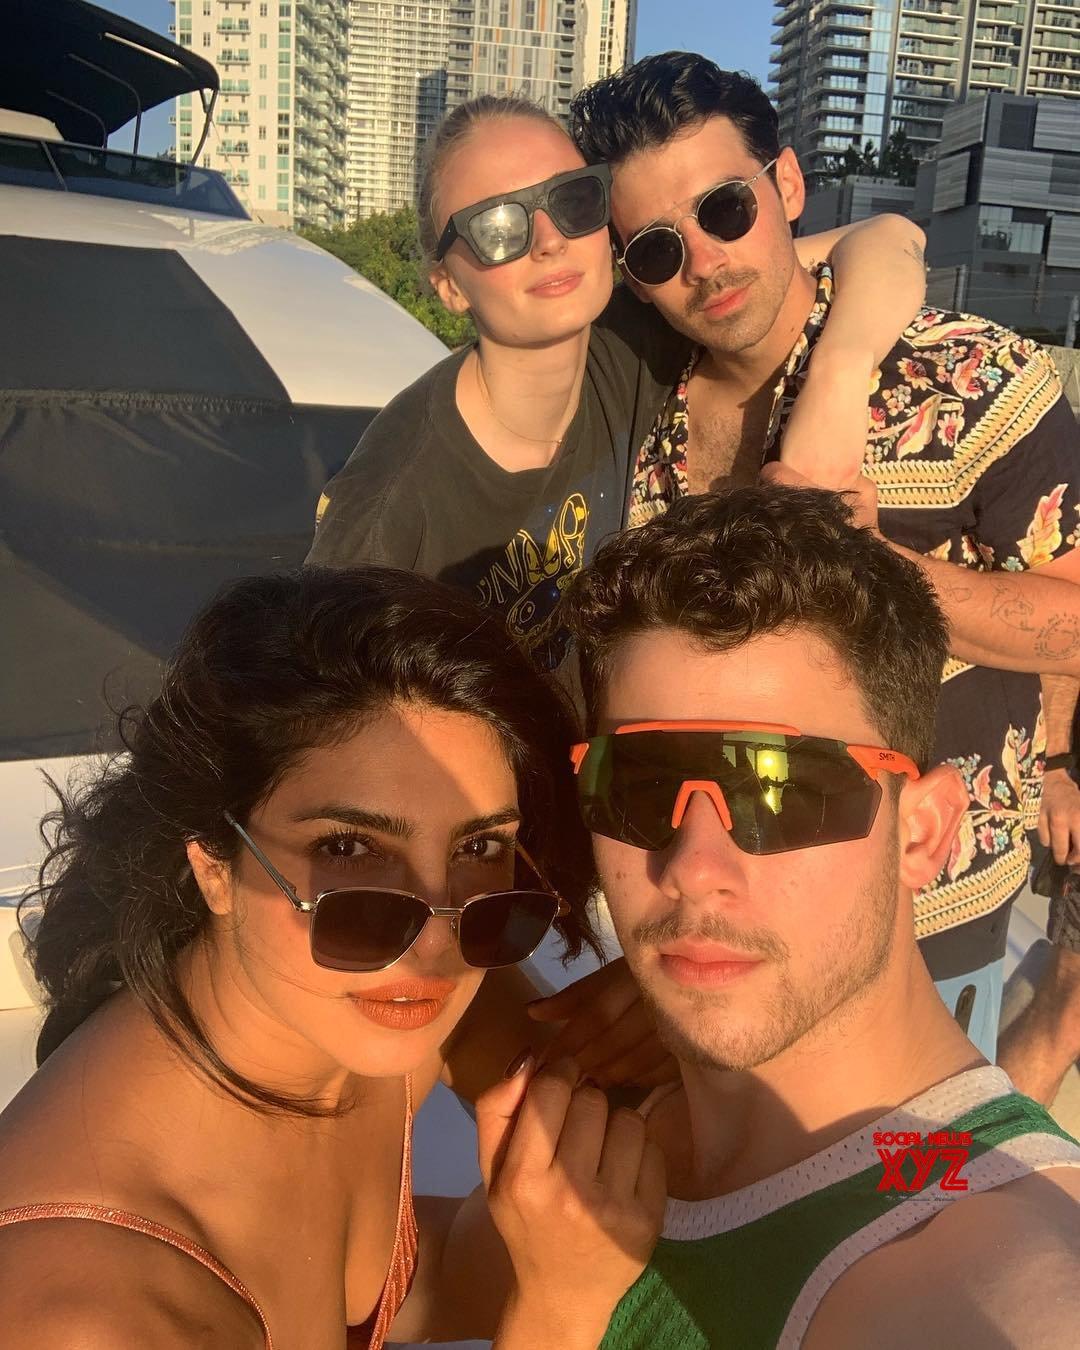 Nick Jonas, Priyanka Chopra, Joe Jonas, Sophie Turner, And Family Stills From A Yacht